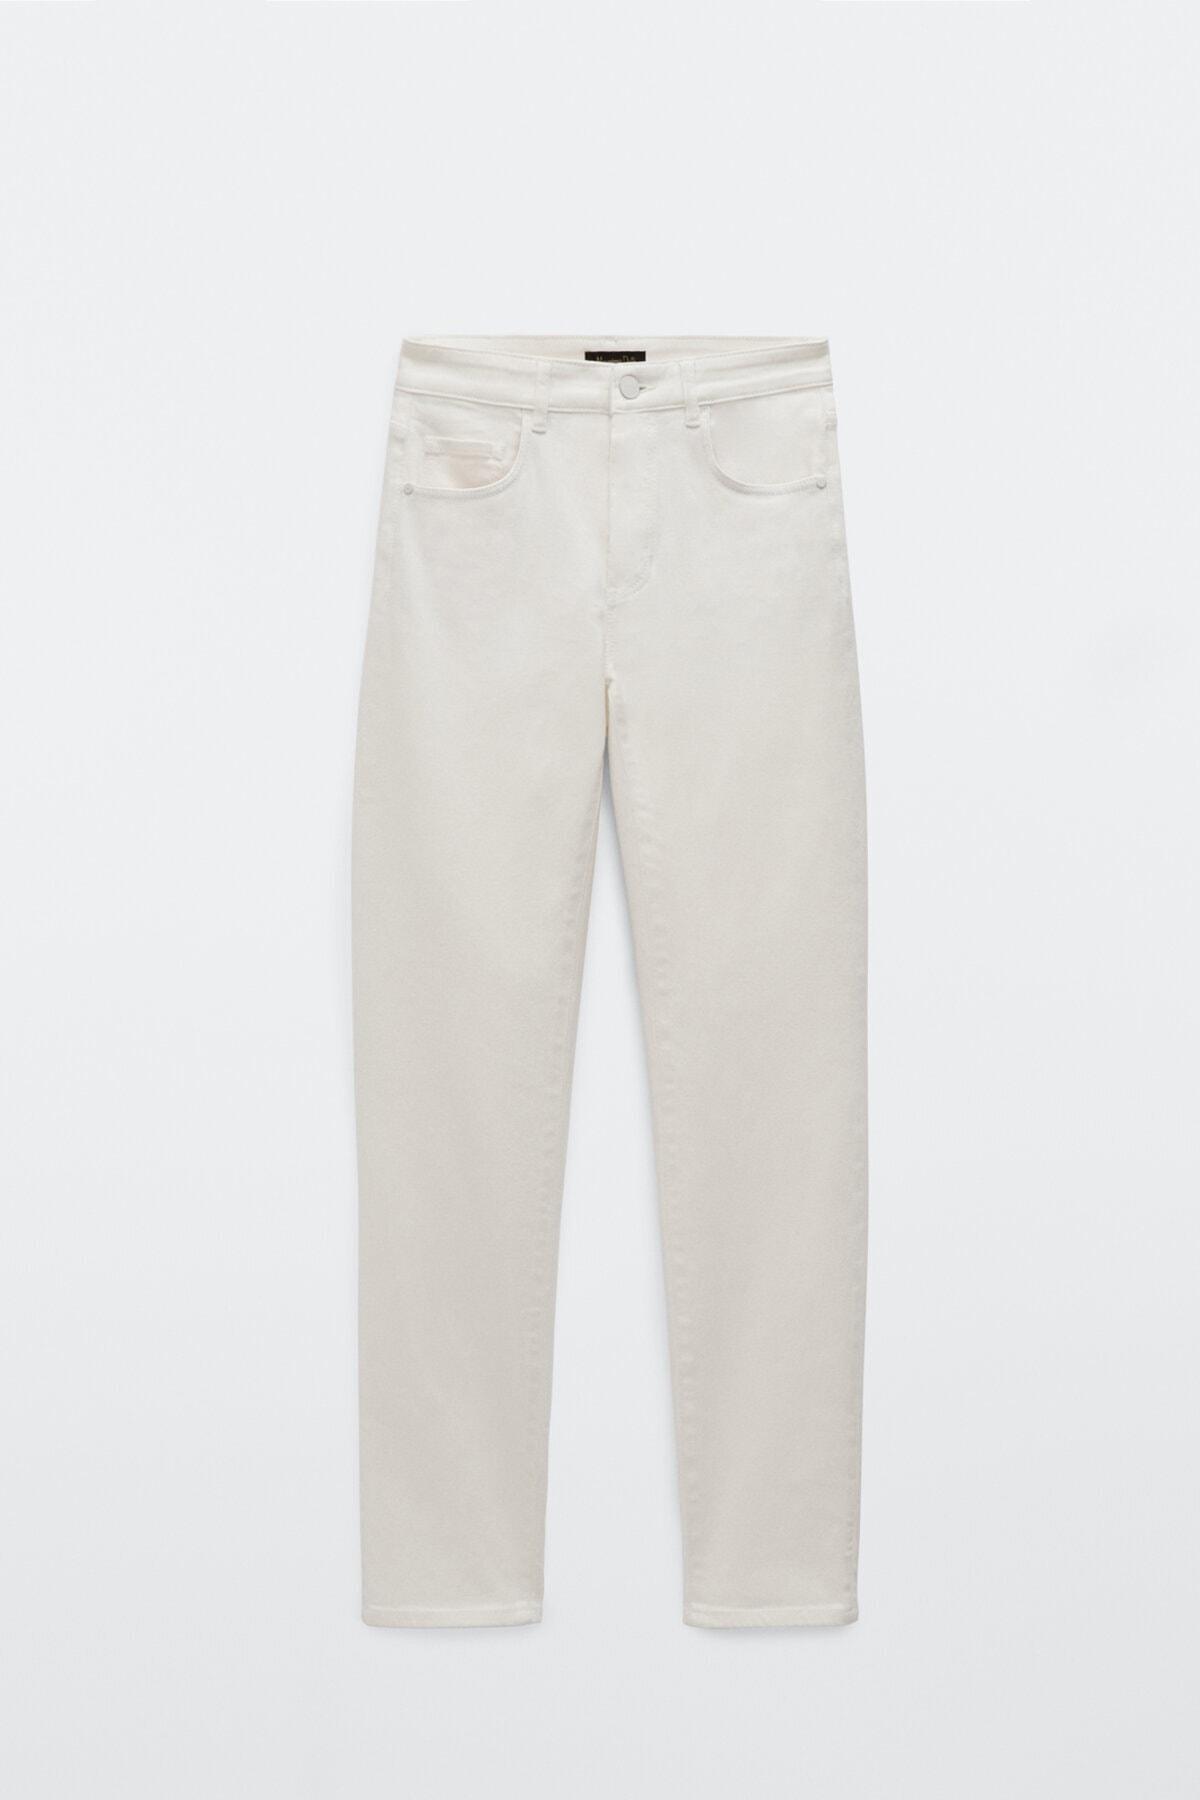 Massimo Dutti Kadın Orta Bel Crop Slim Fit Jean 05065712